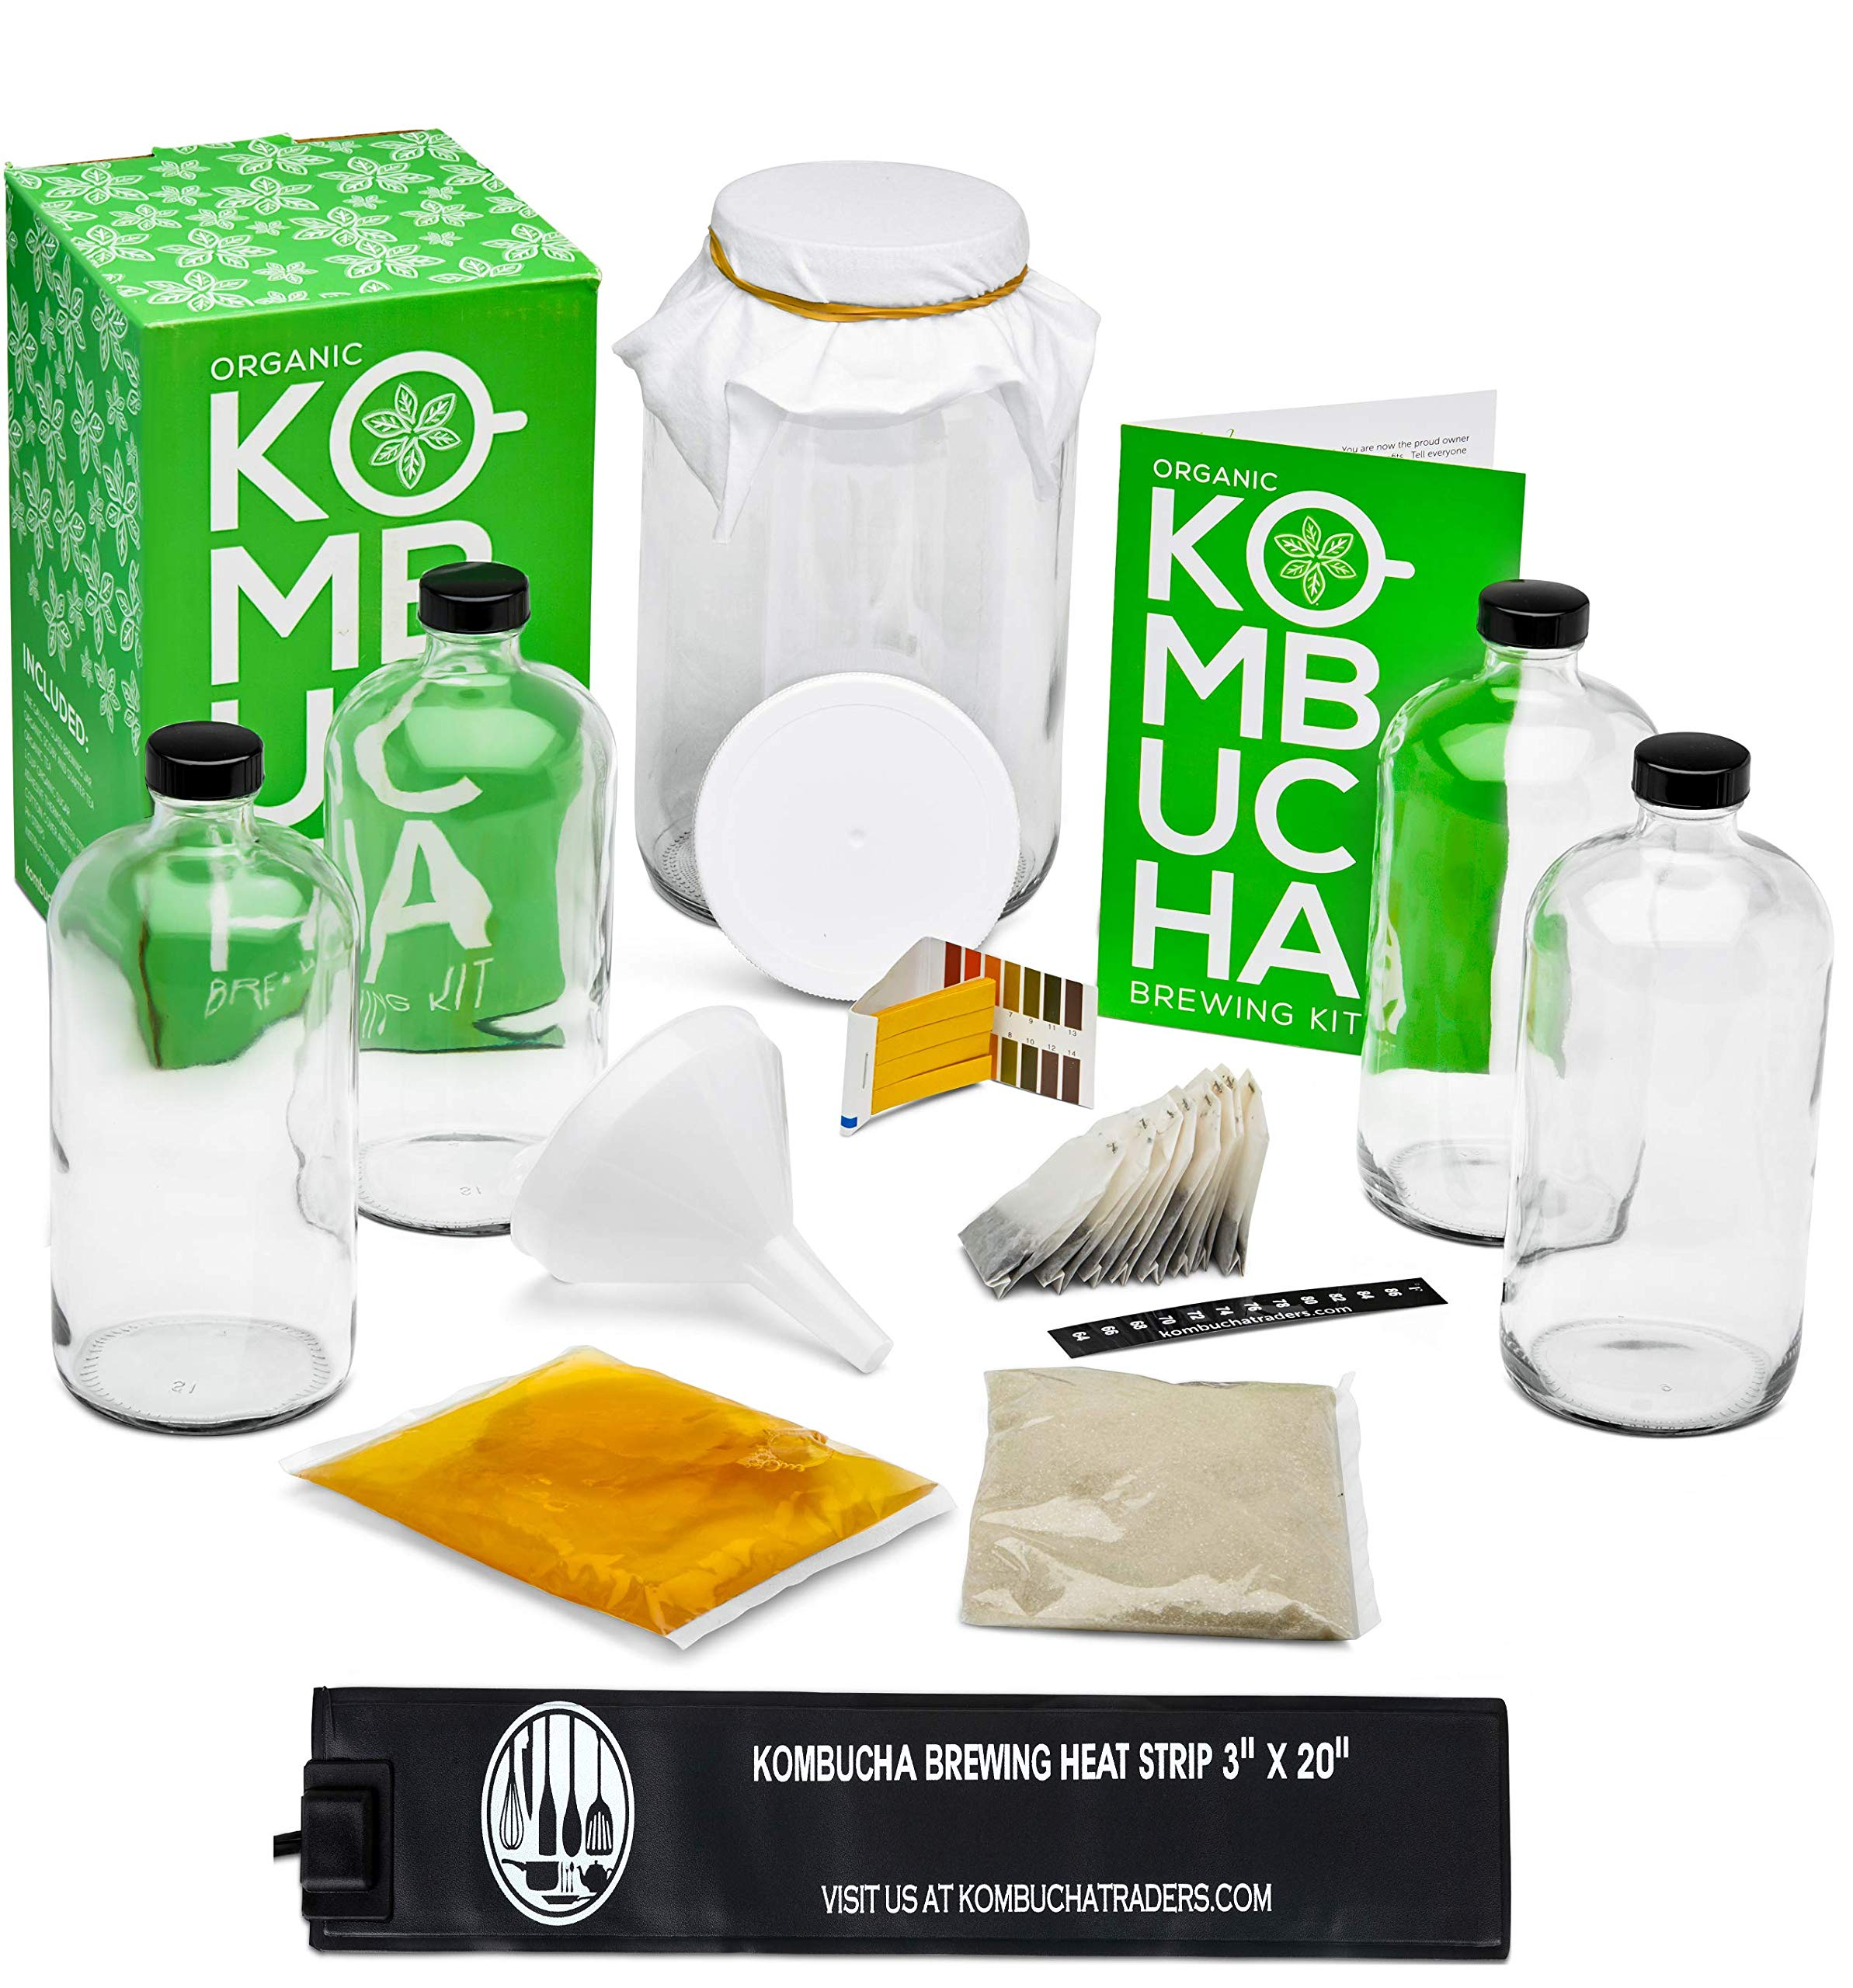 Kitchentoolz Two Phase Kombucha Starter Kit w/Heat Wrap- Kombucha Jar, Kombucha Bottles, Scoby and Basic Ingredients for a Full Kombucha Experience (Clear Bottles)